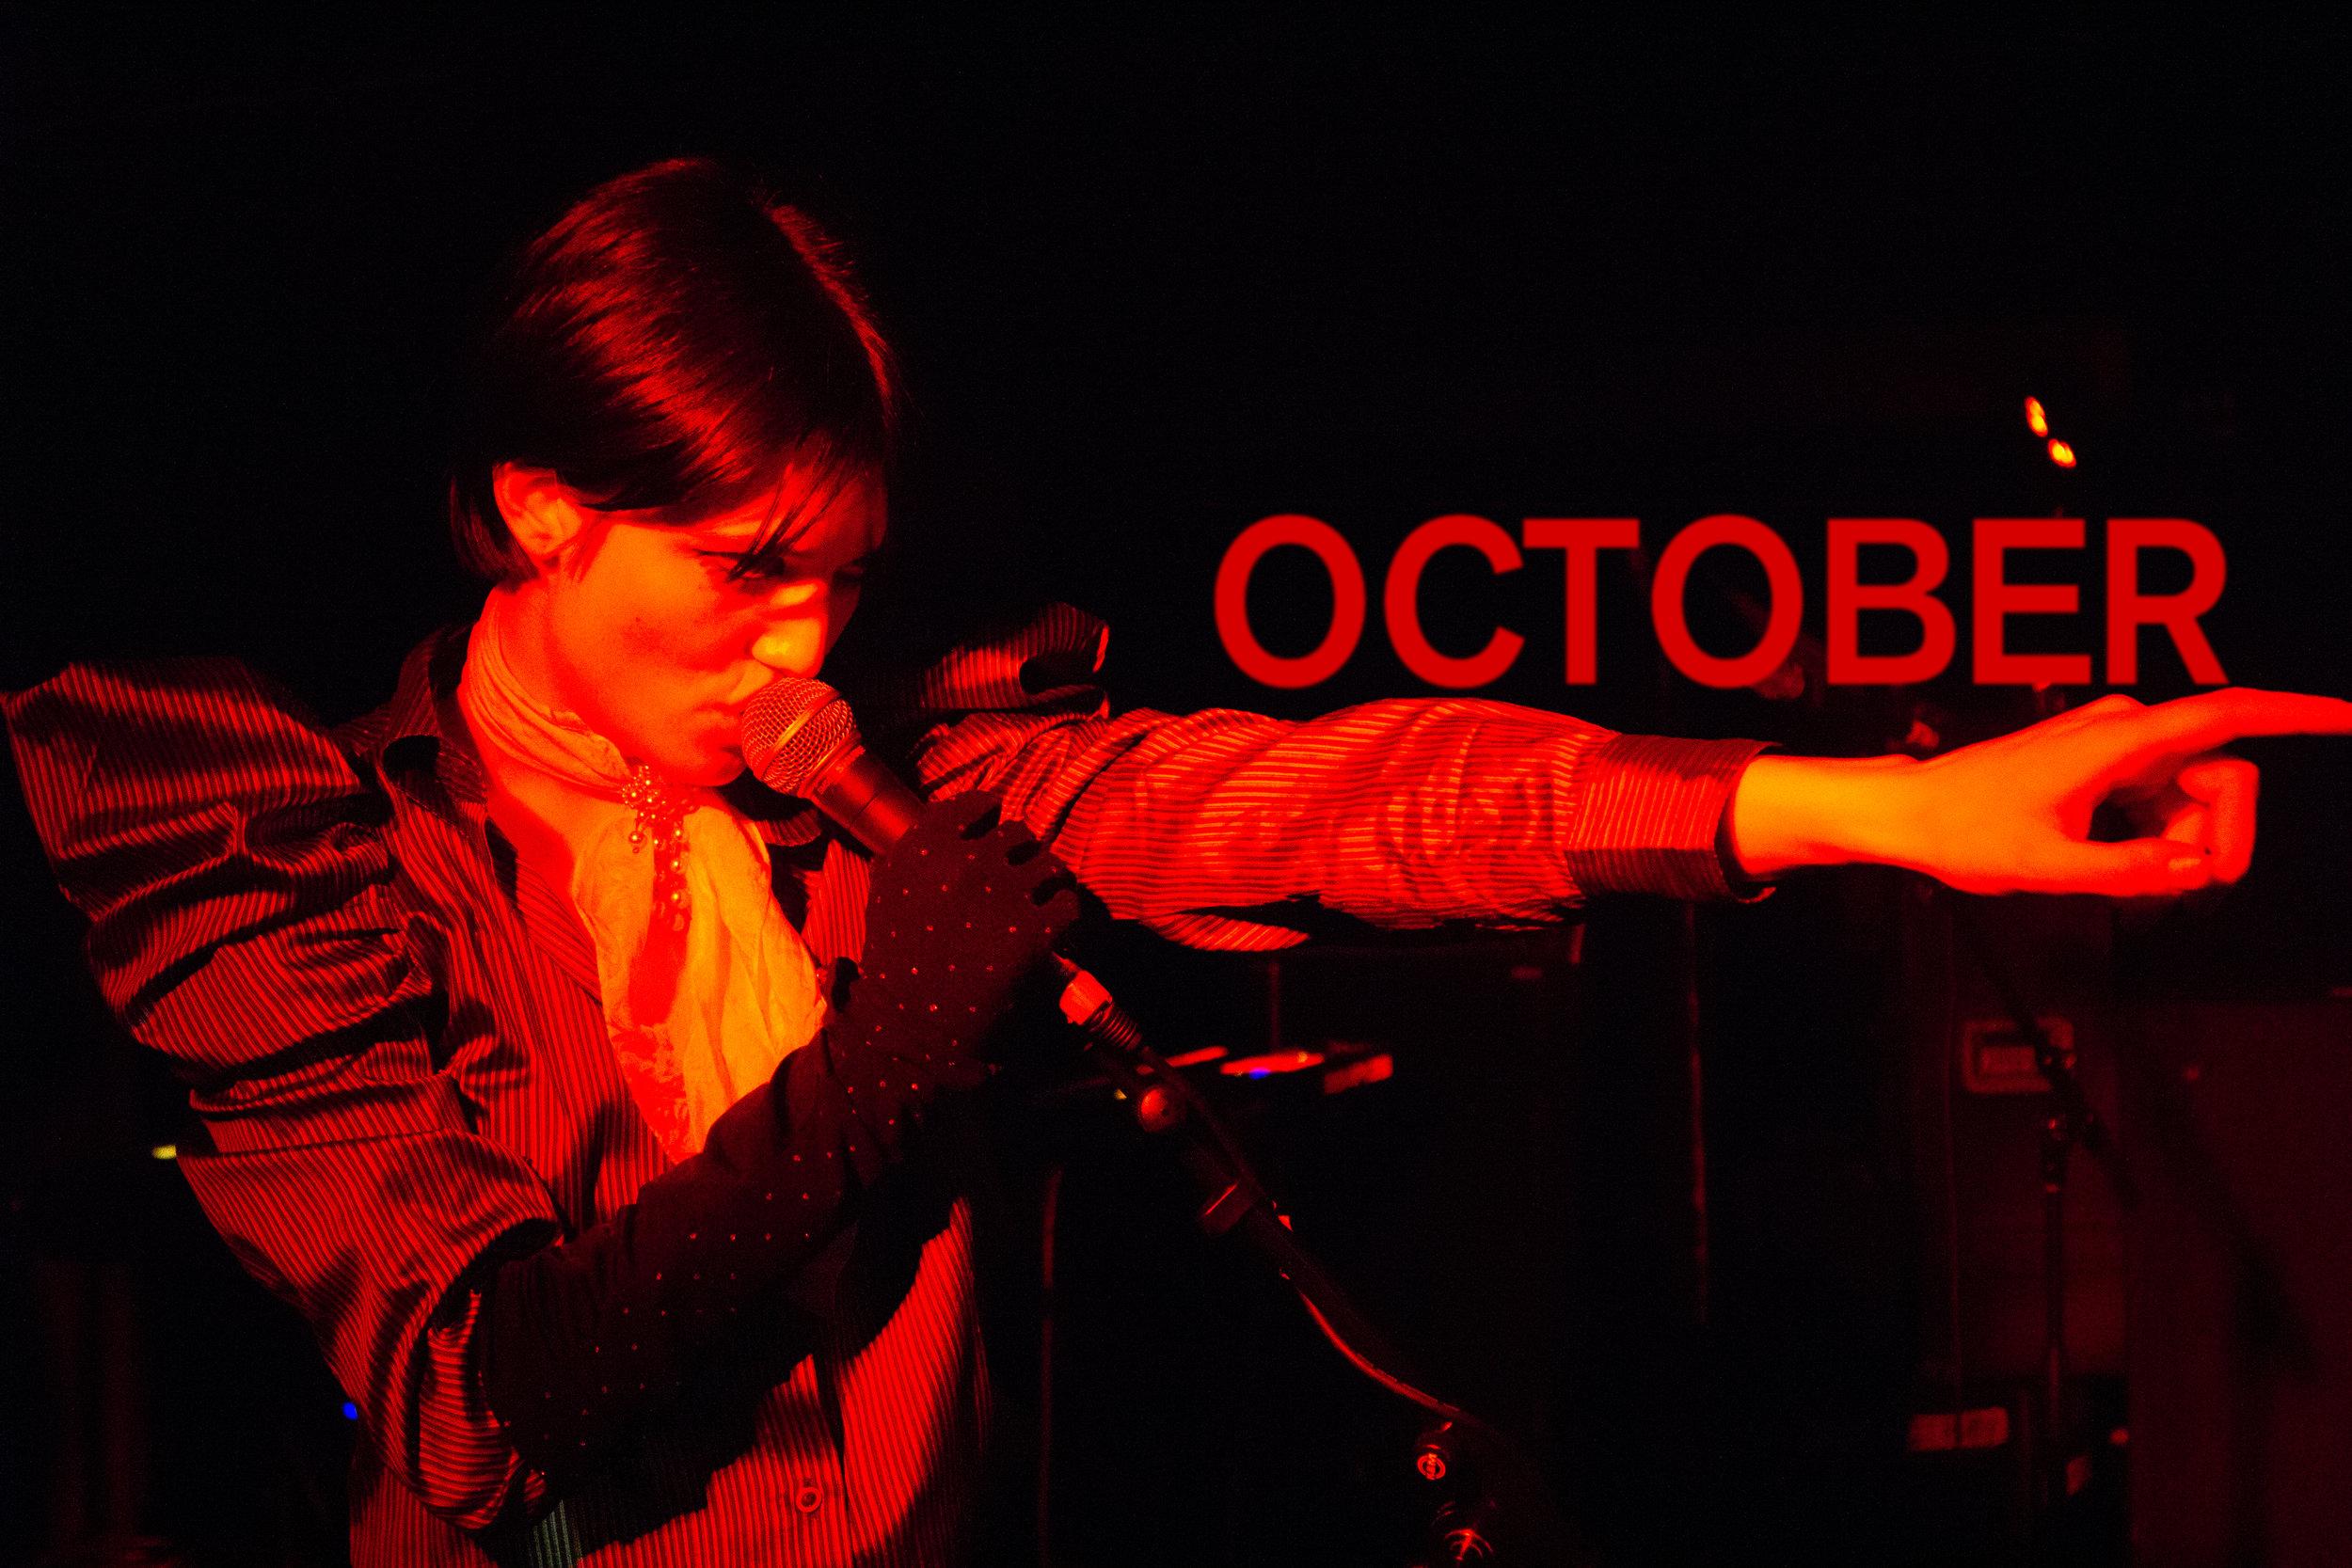 OctoberTitle.jpg